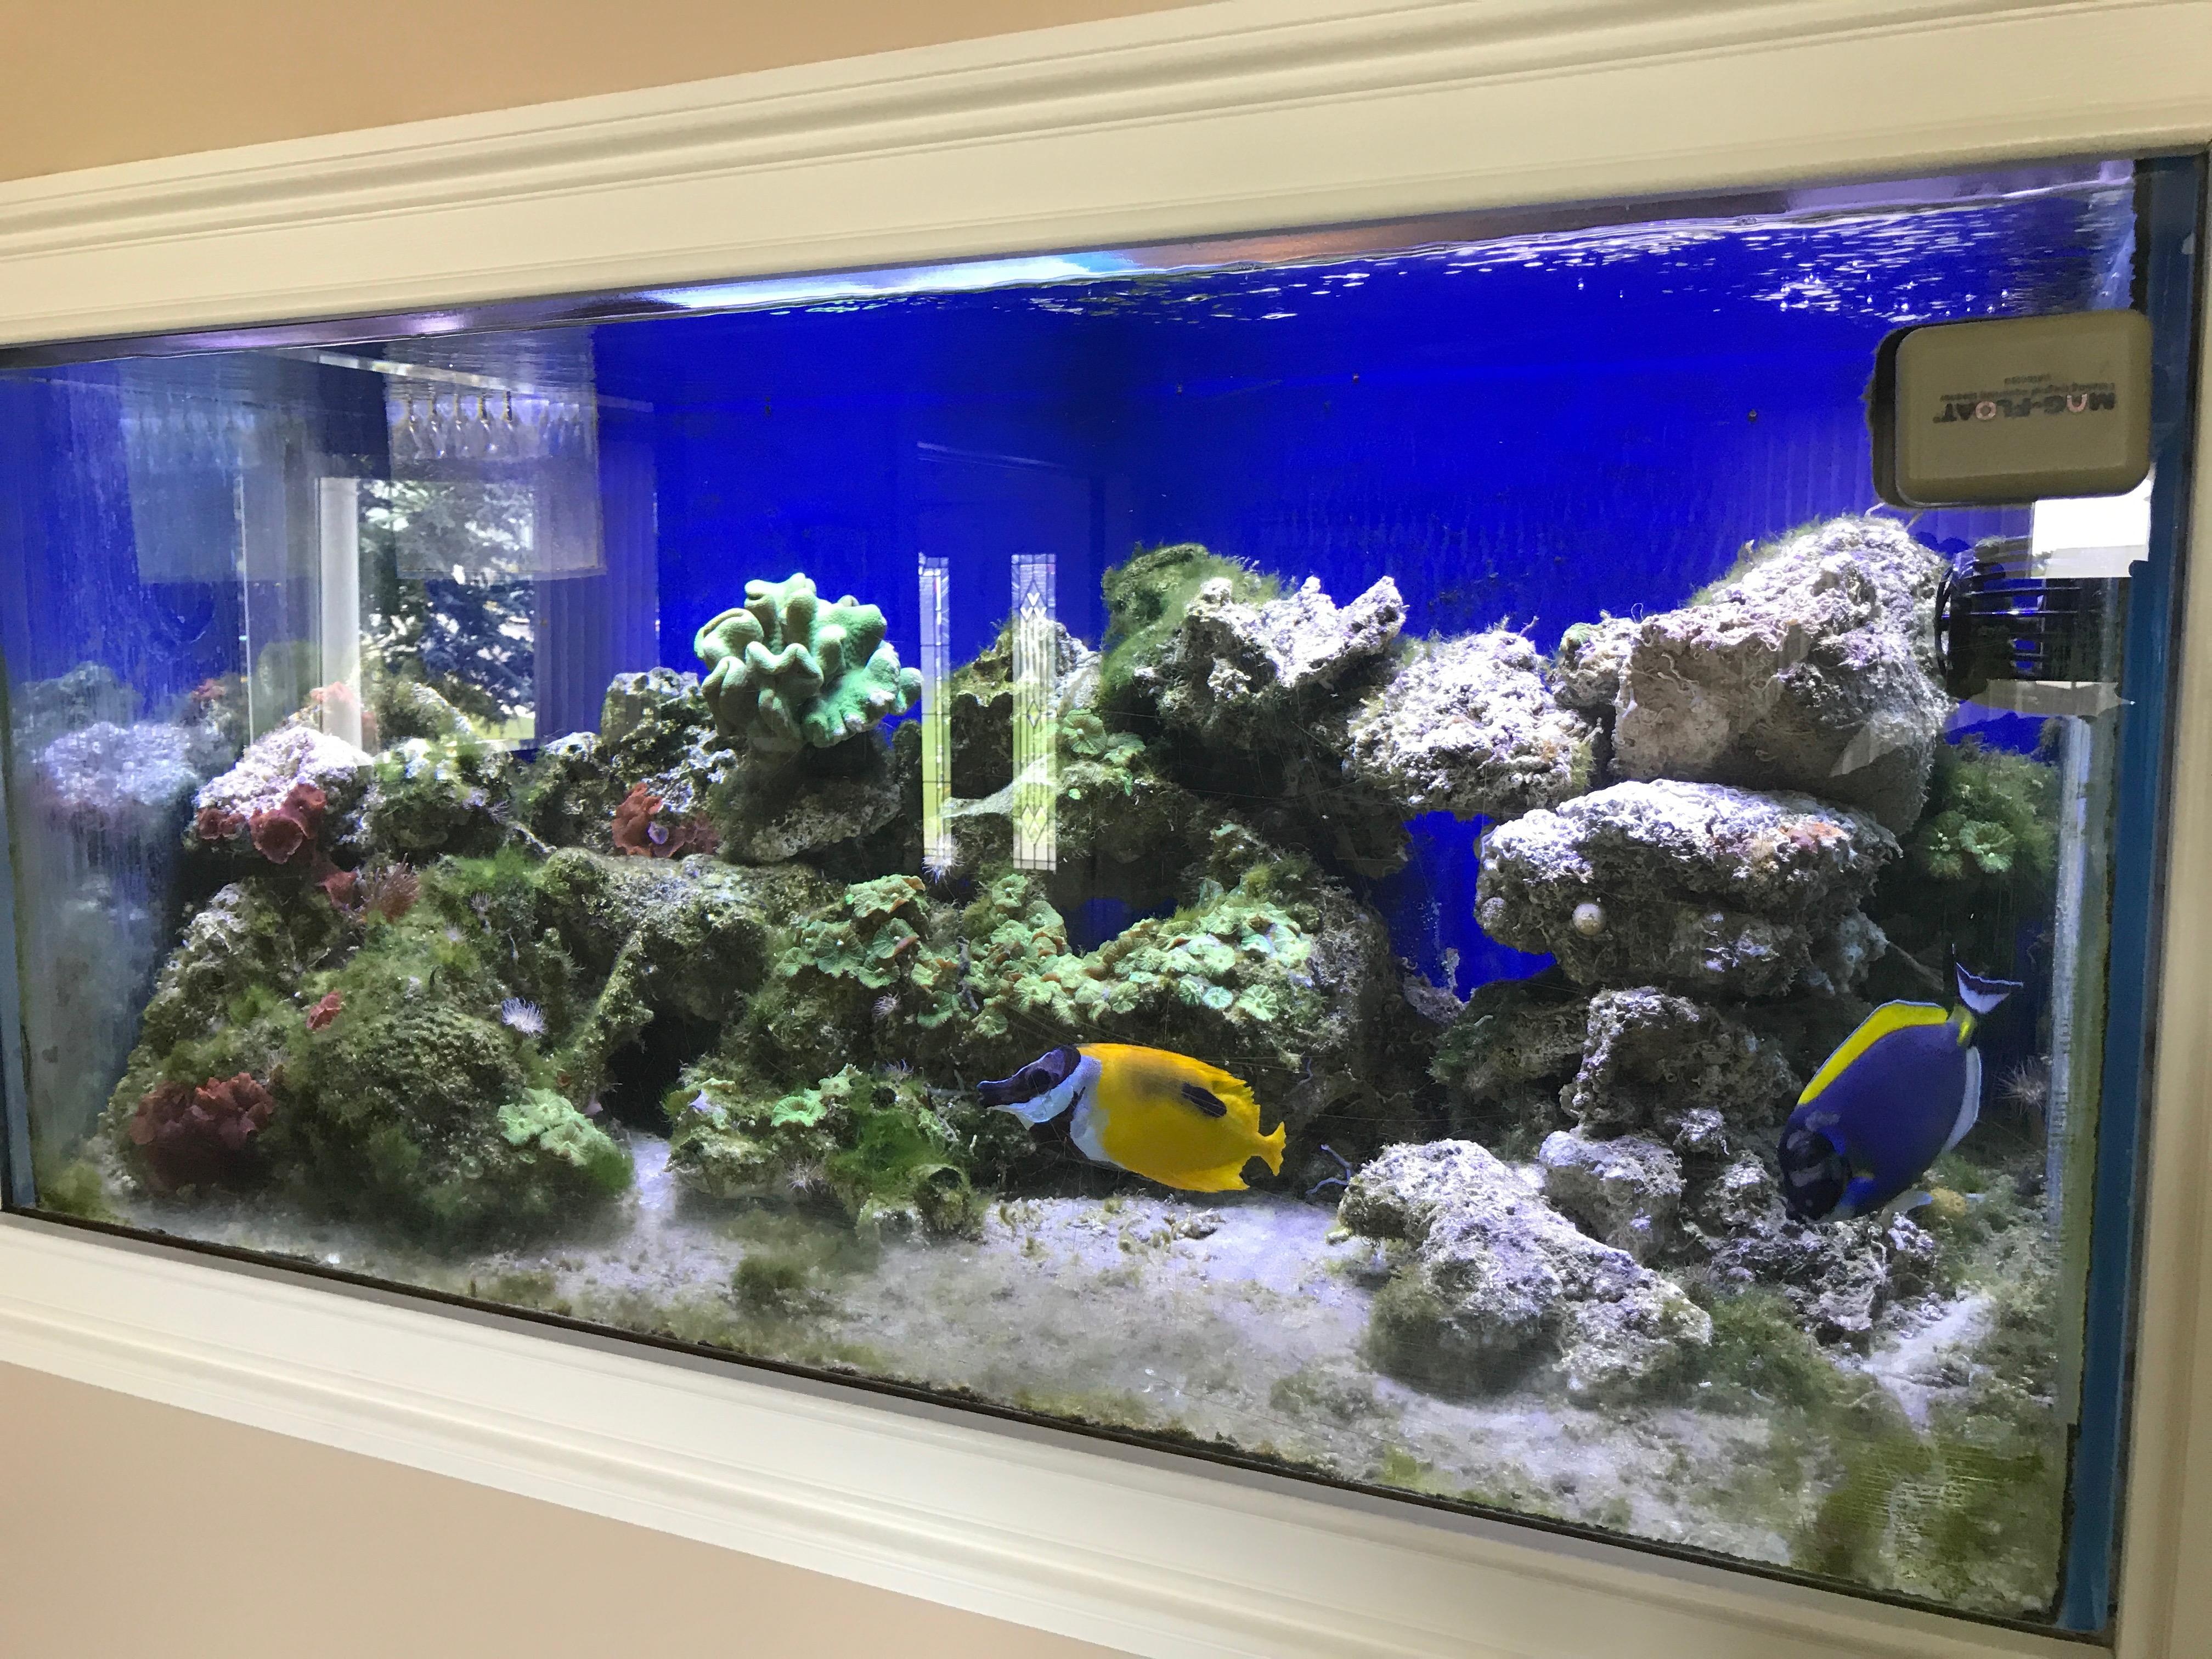 Aquarium Bottom Light Start At Bottom Another View Same